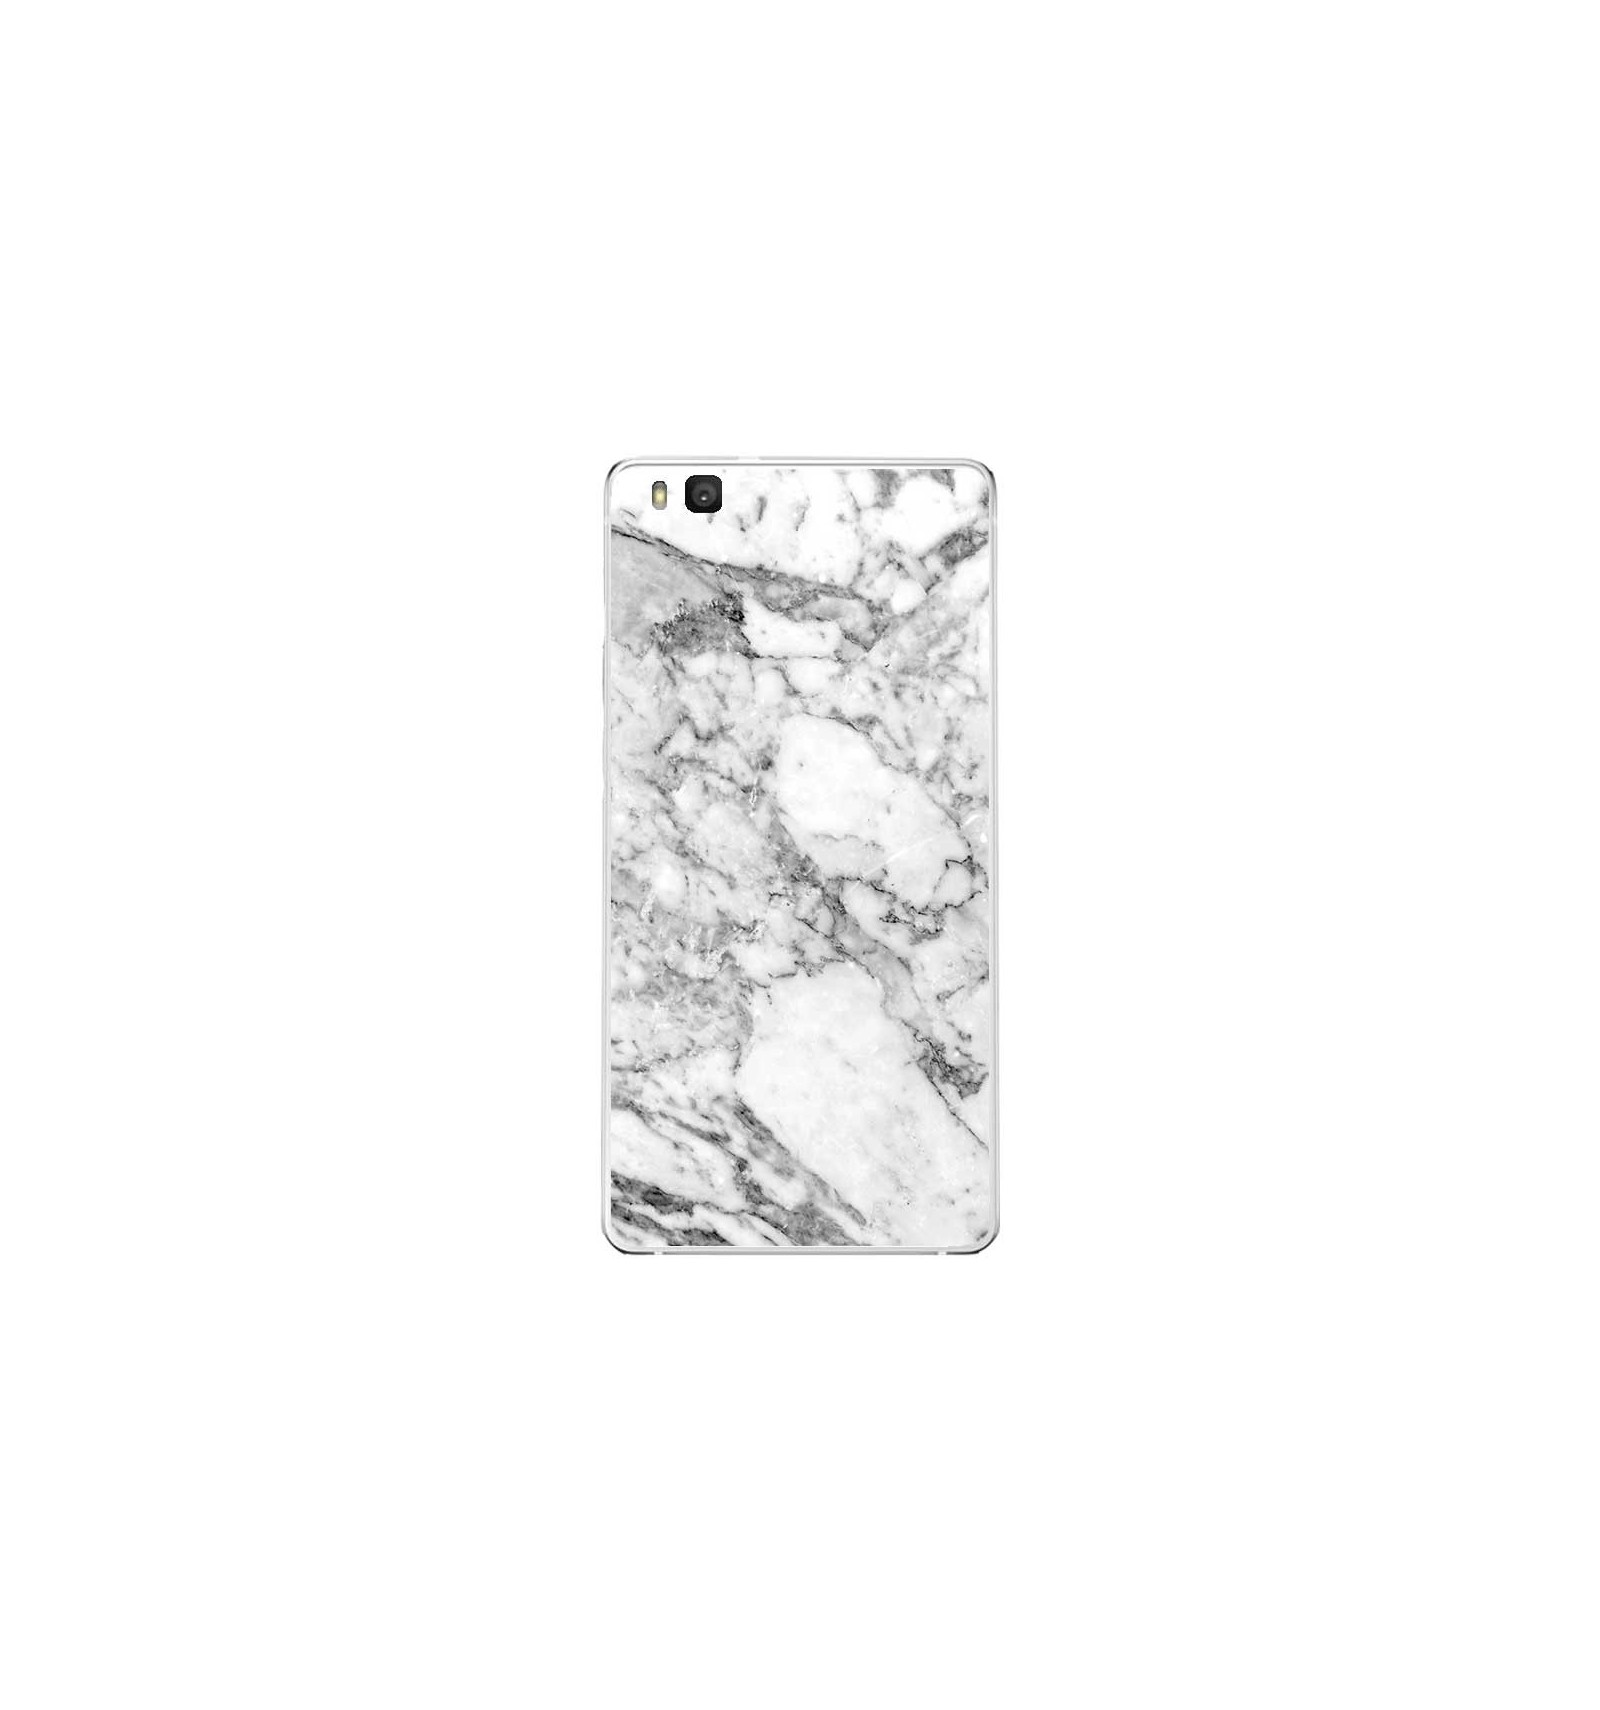 coque p9 lite huawei marbre